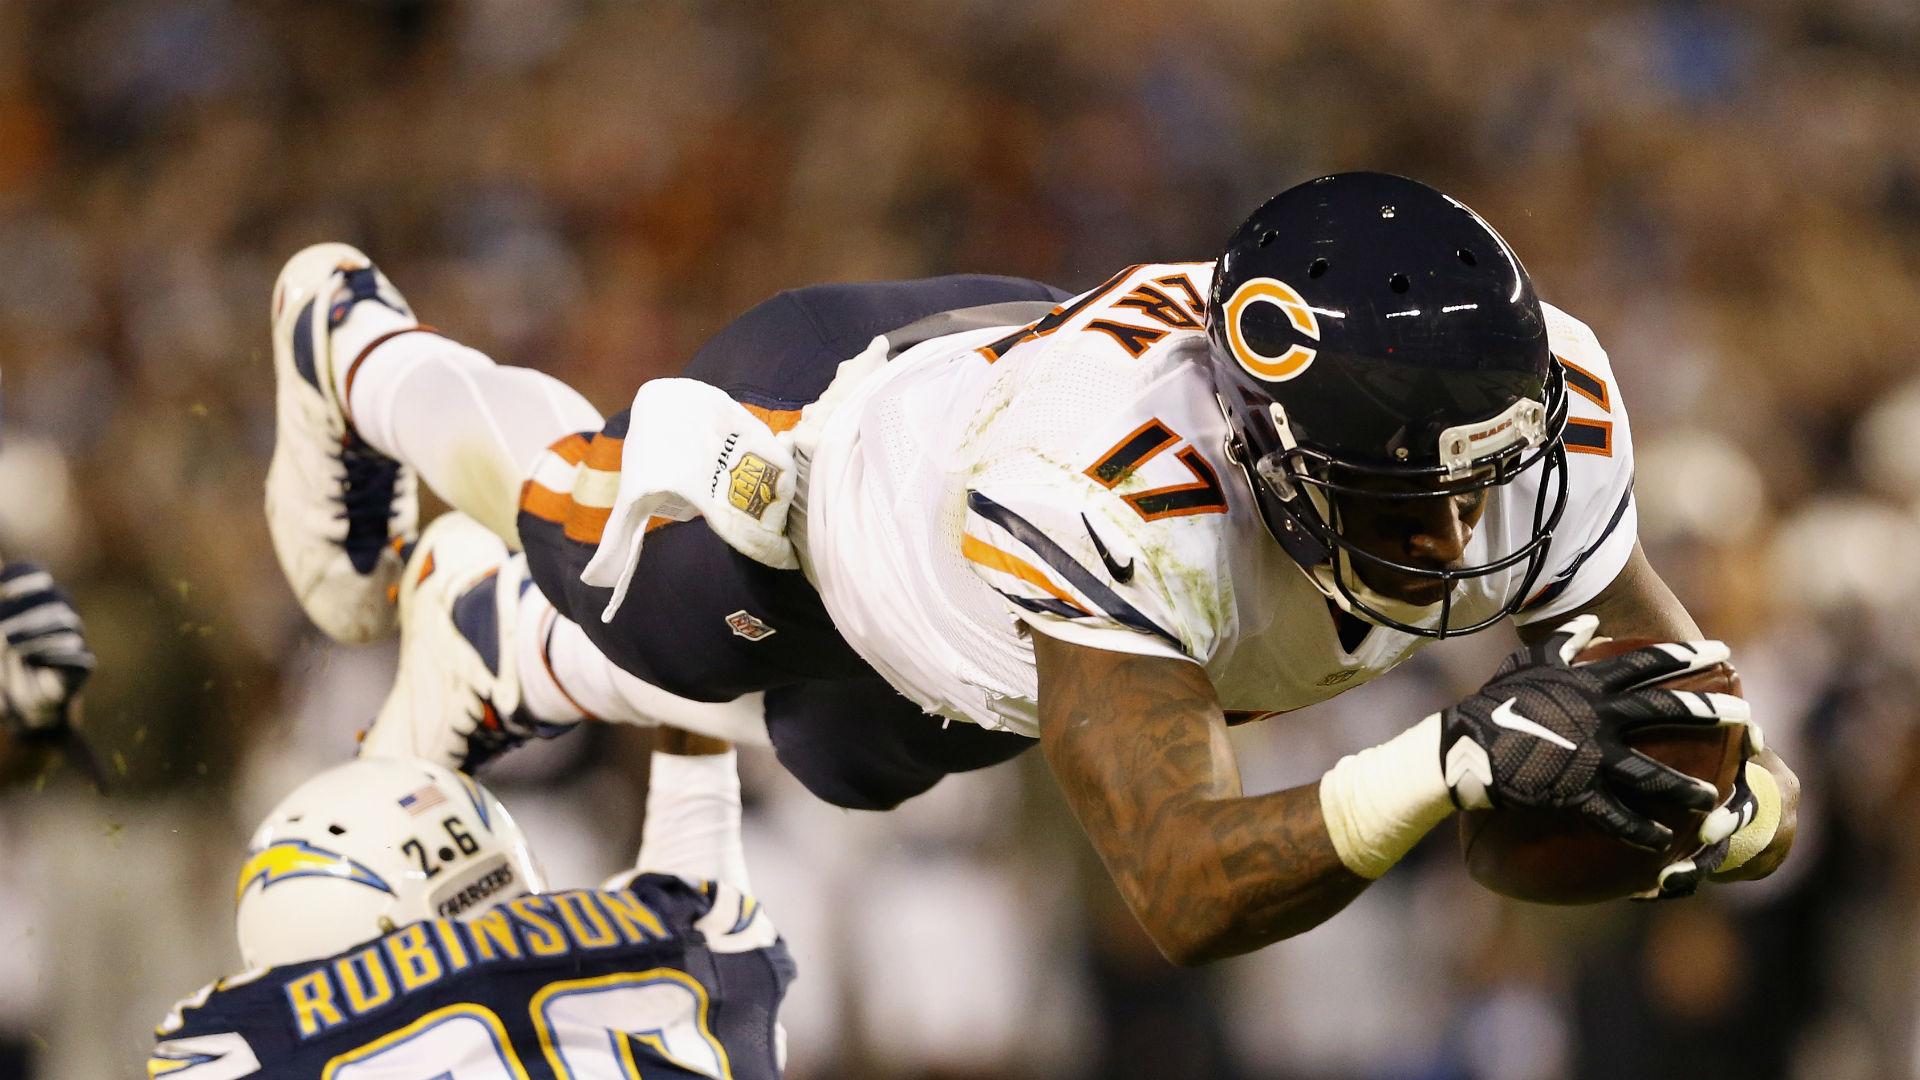 Chicago Bears still negotiating with Alshon Jeffery